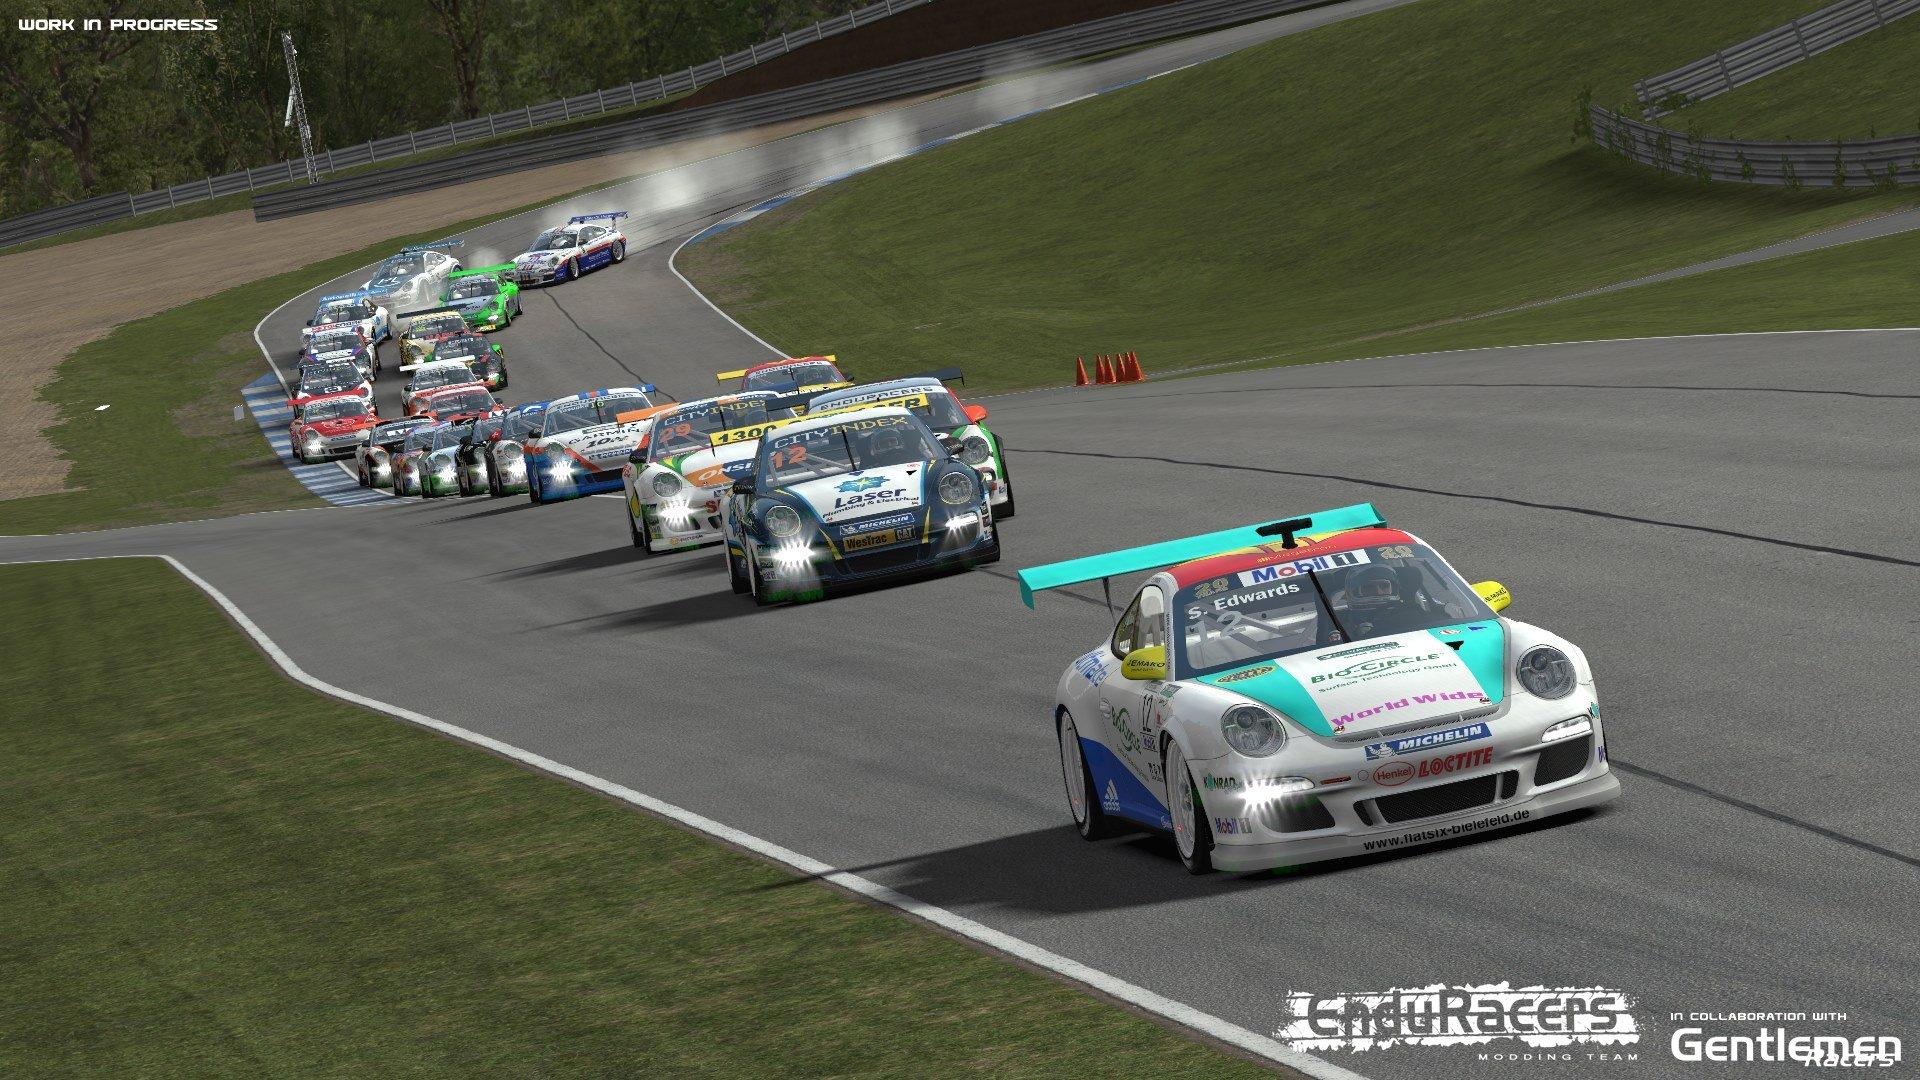 EnduRacers Preview Flat6 Mod for rFactor 2 - Inside Sim Racing